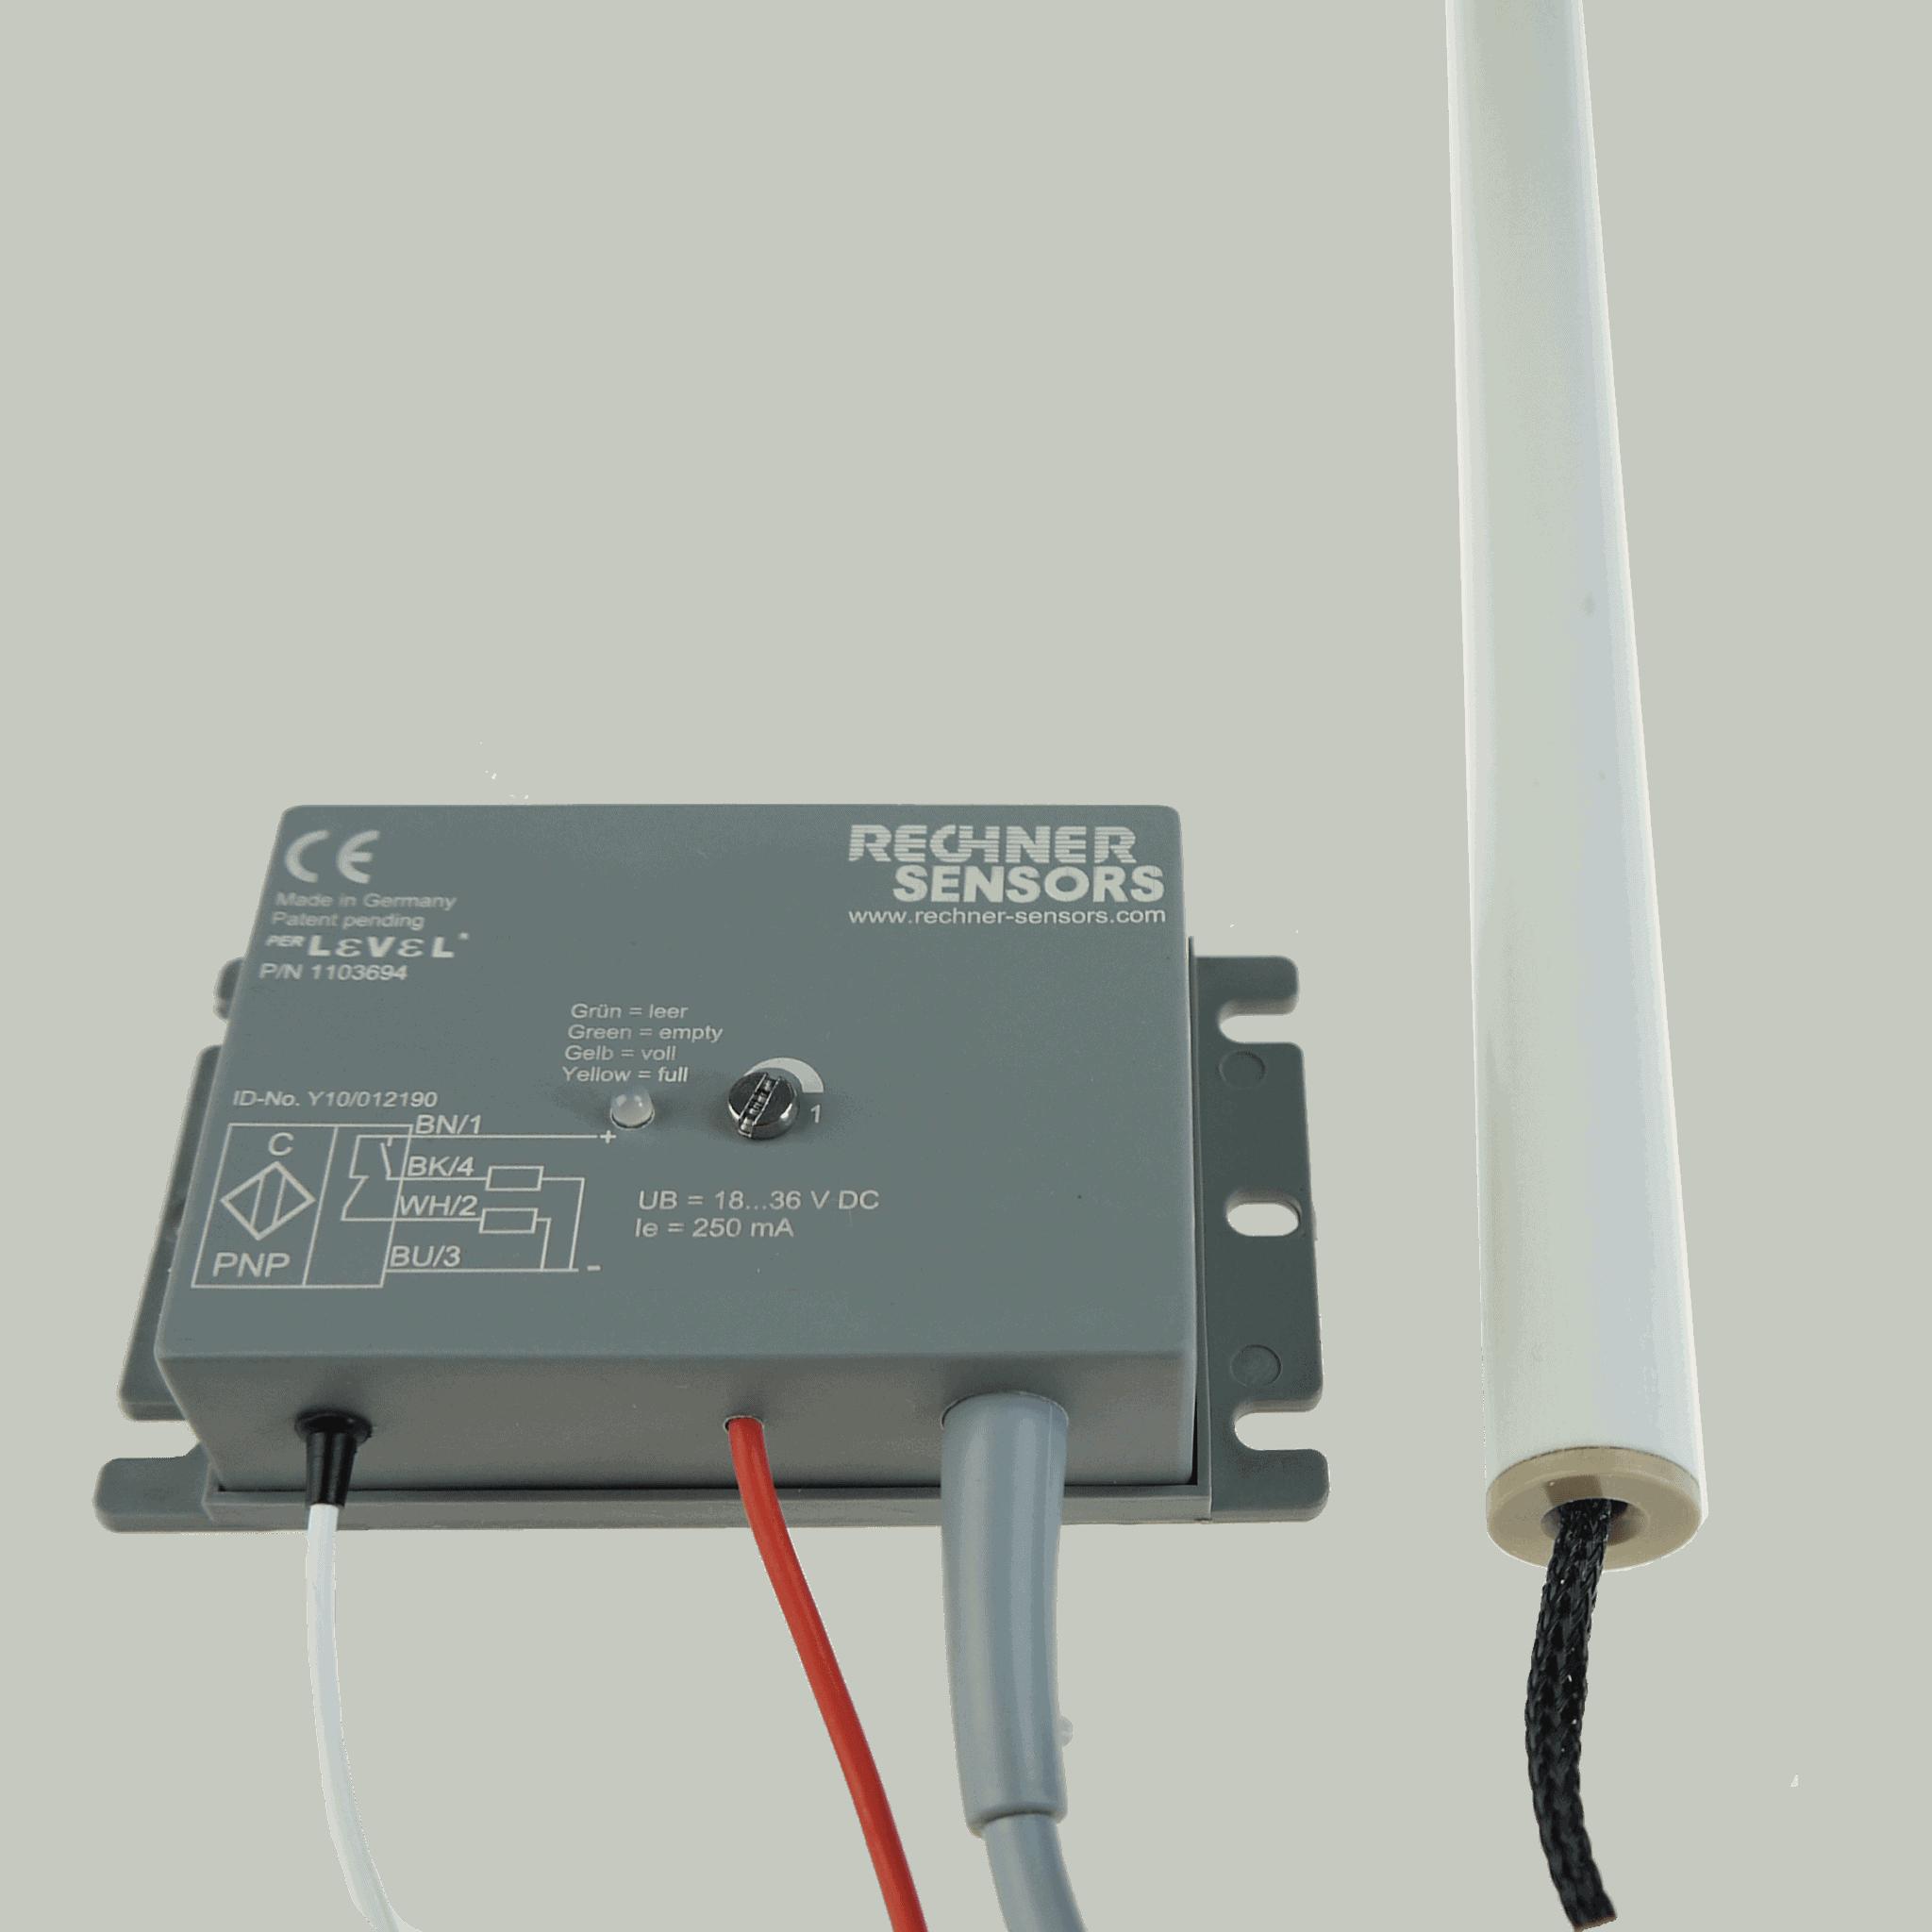 KFK-51-15-300-15-GFK-D16-X0E-L-P-A-Z02 - Rechner Sensors